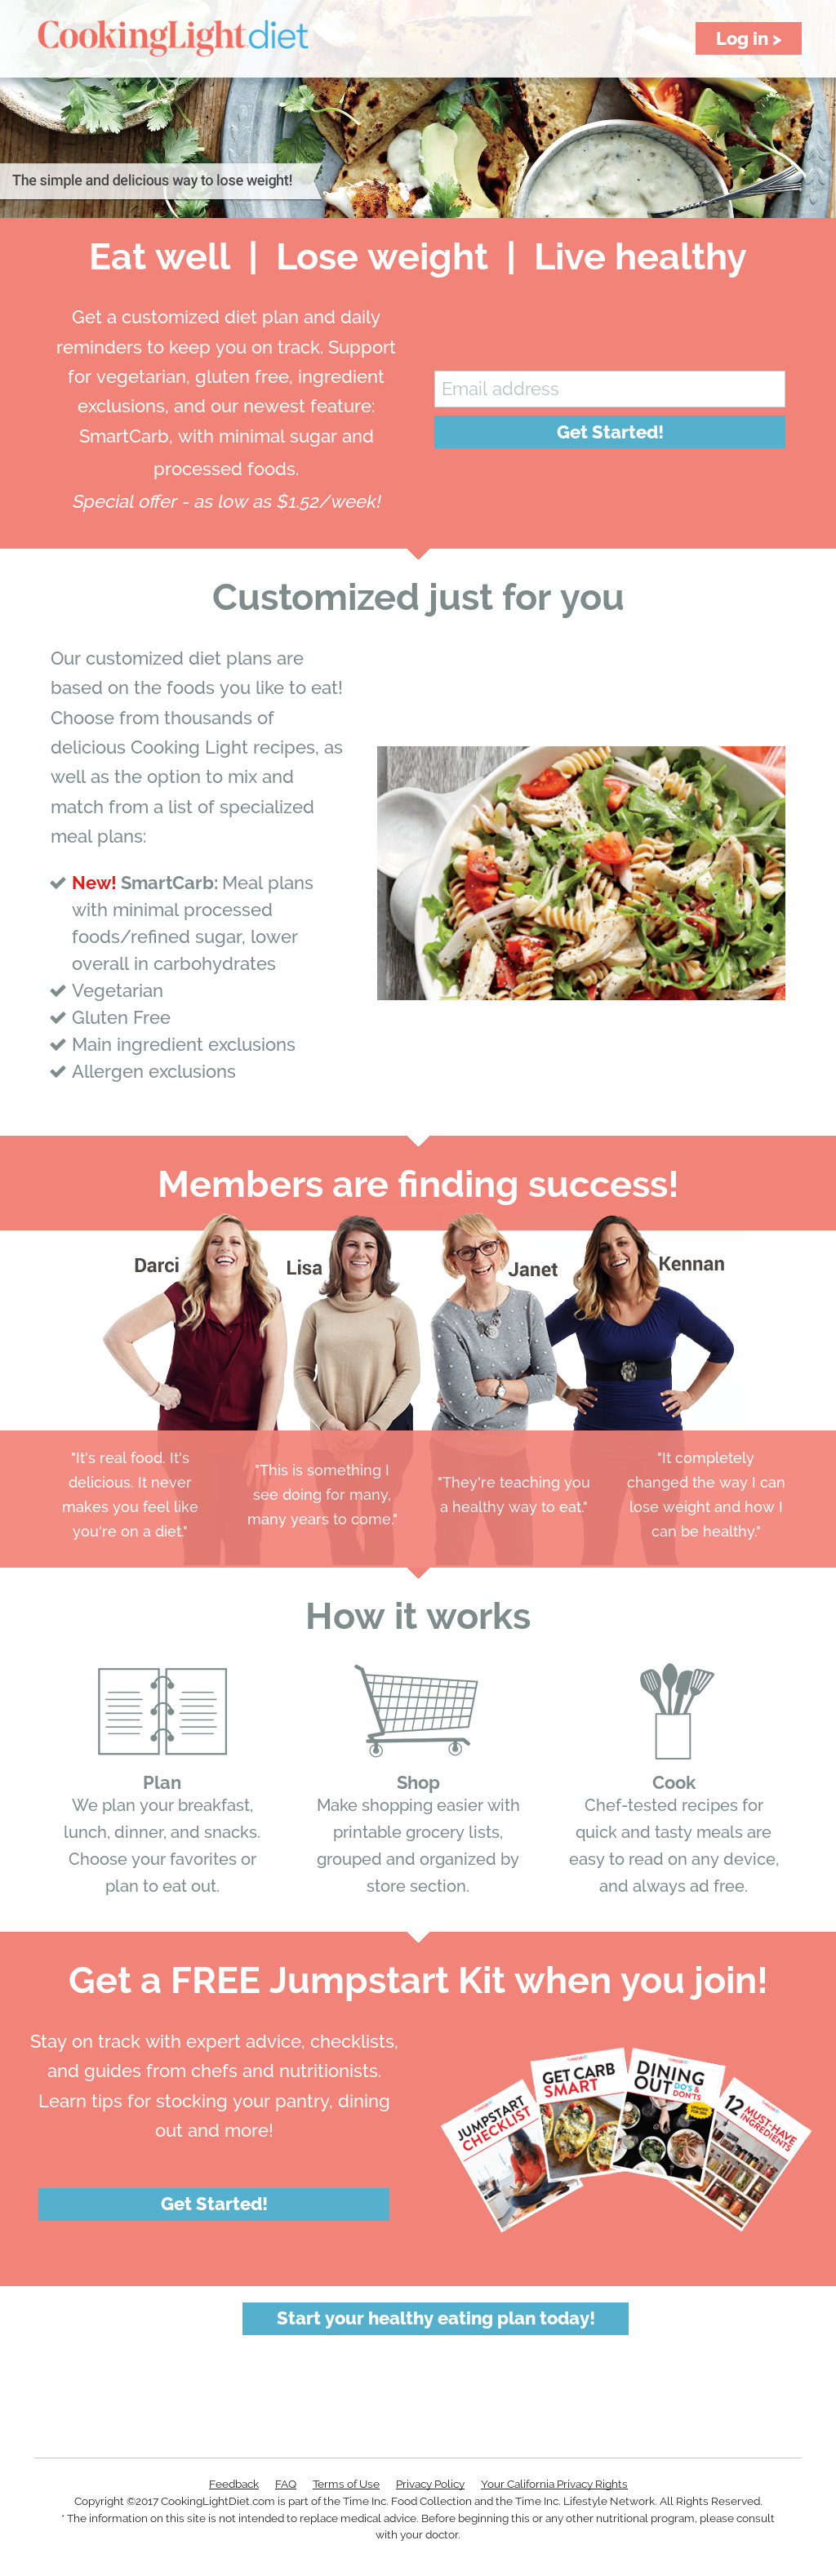 Cooking Light Diet Website History